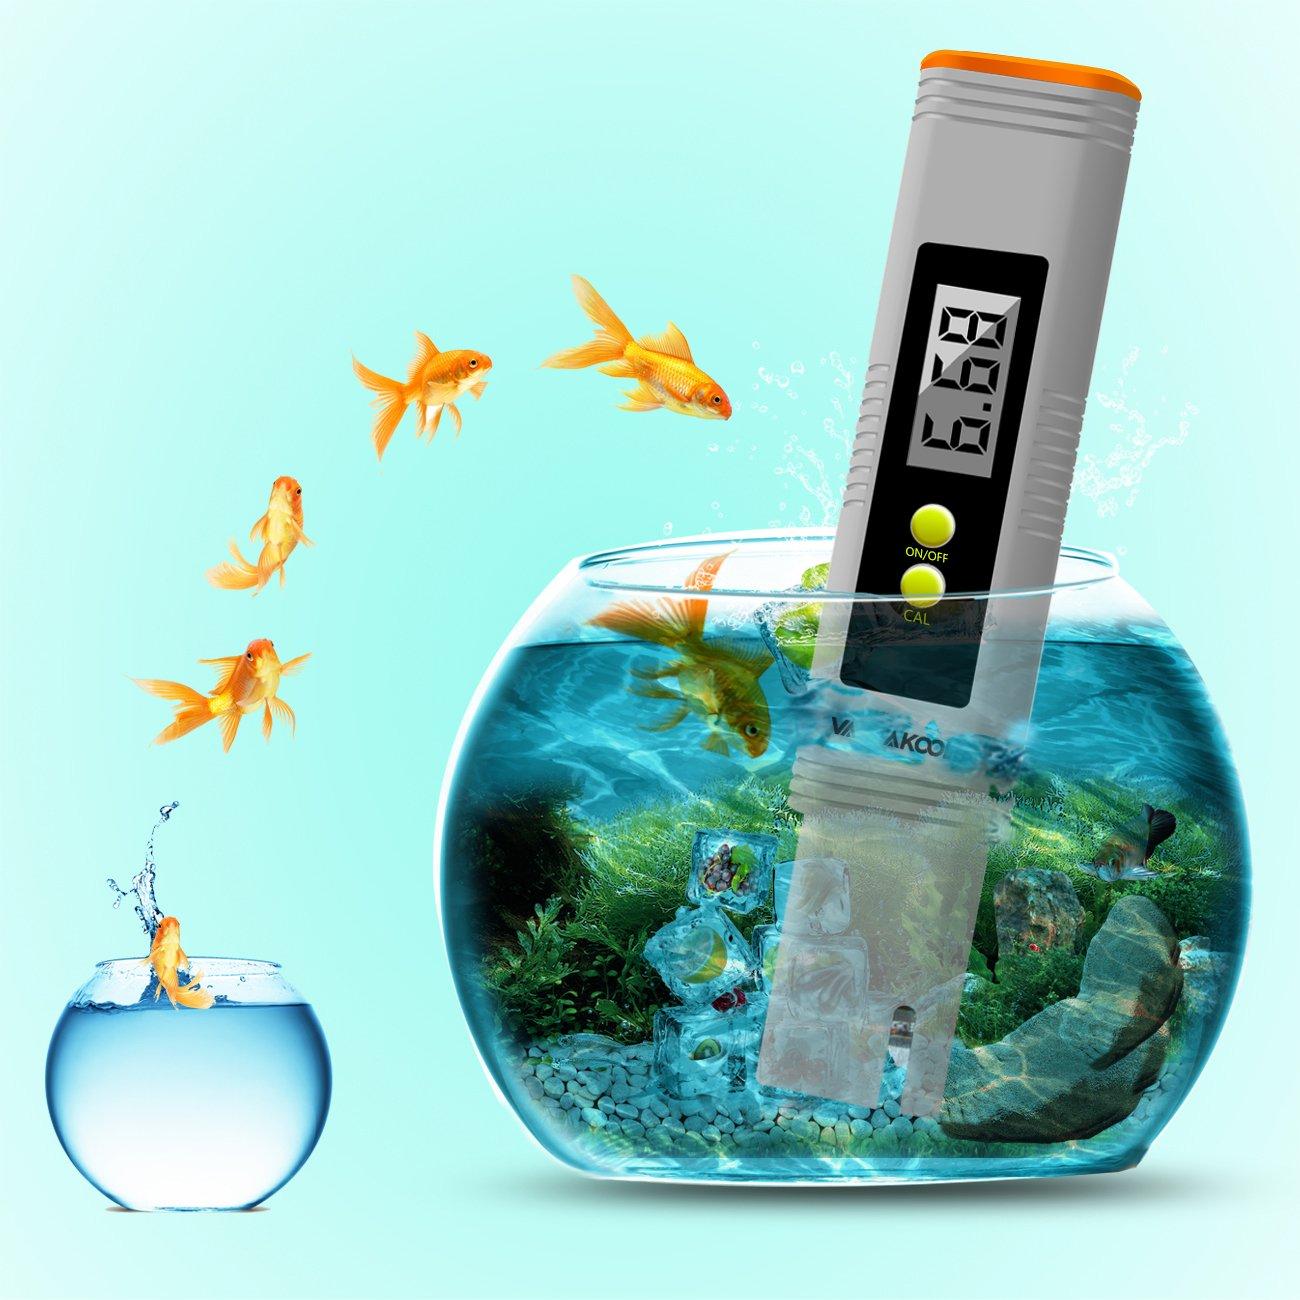 VANTAKOOL Digital PH Meter, 0.01 PH High Accuracy Pocket Size PH Meter/PH Tester with 0-14.0 Measuring Range, Water Quality Tester for Household Drinking Water, Swimming Pools, Aquariums (Orange) by VantaKool (Image #2)